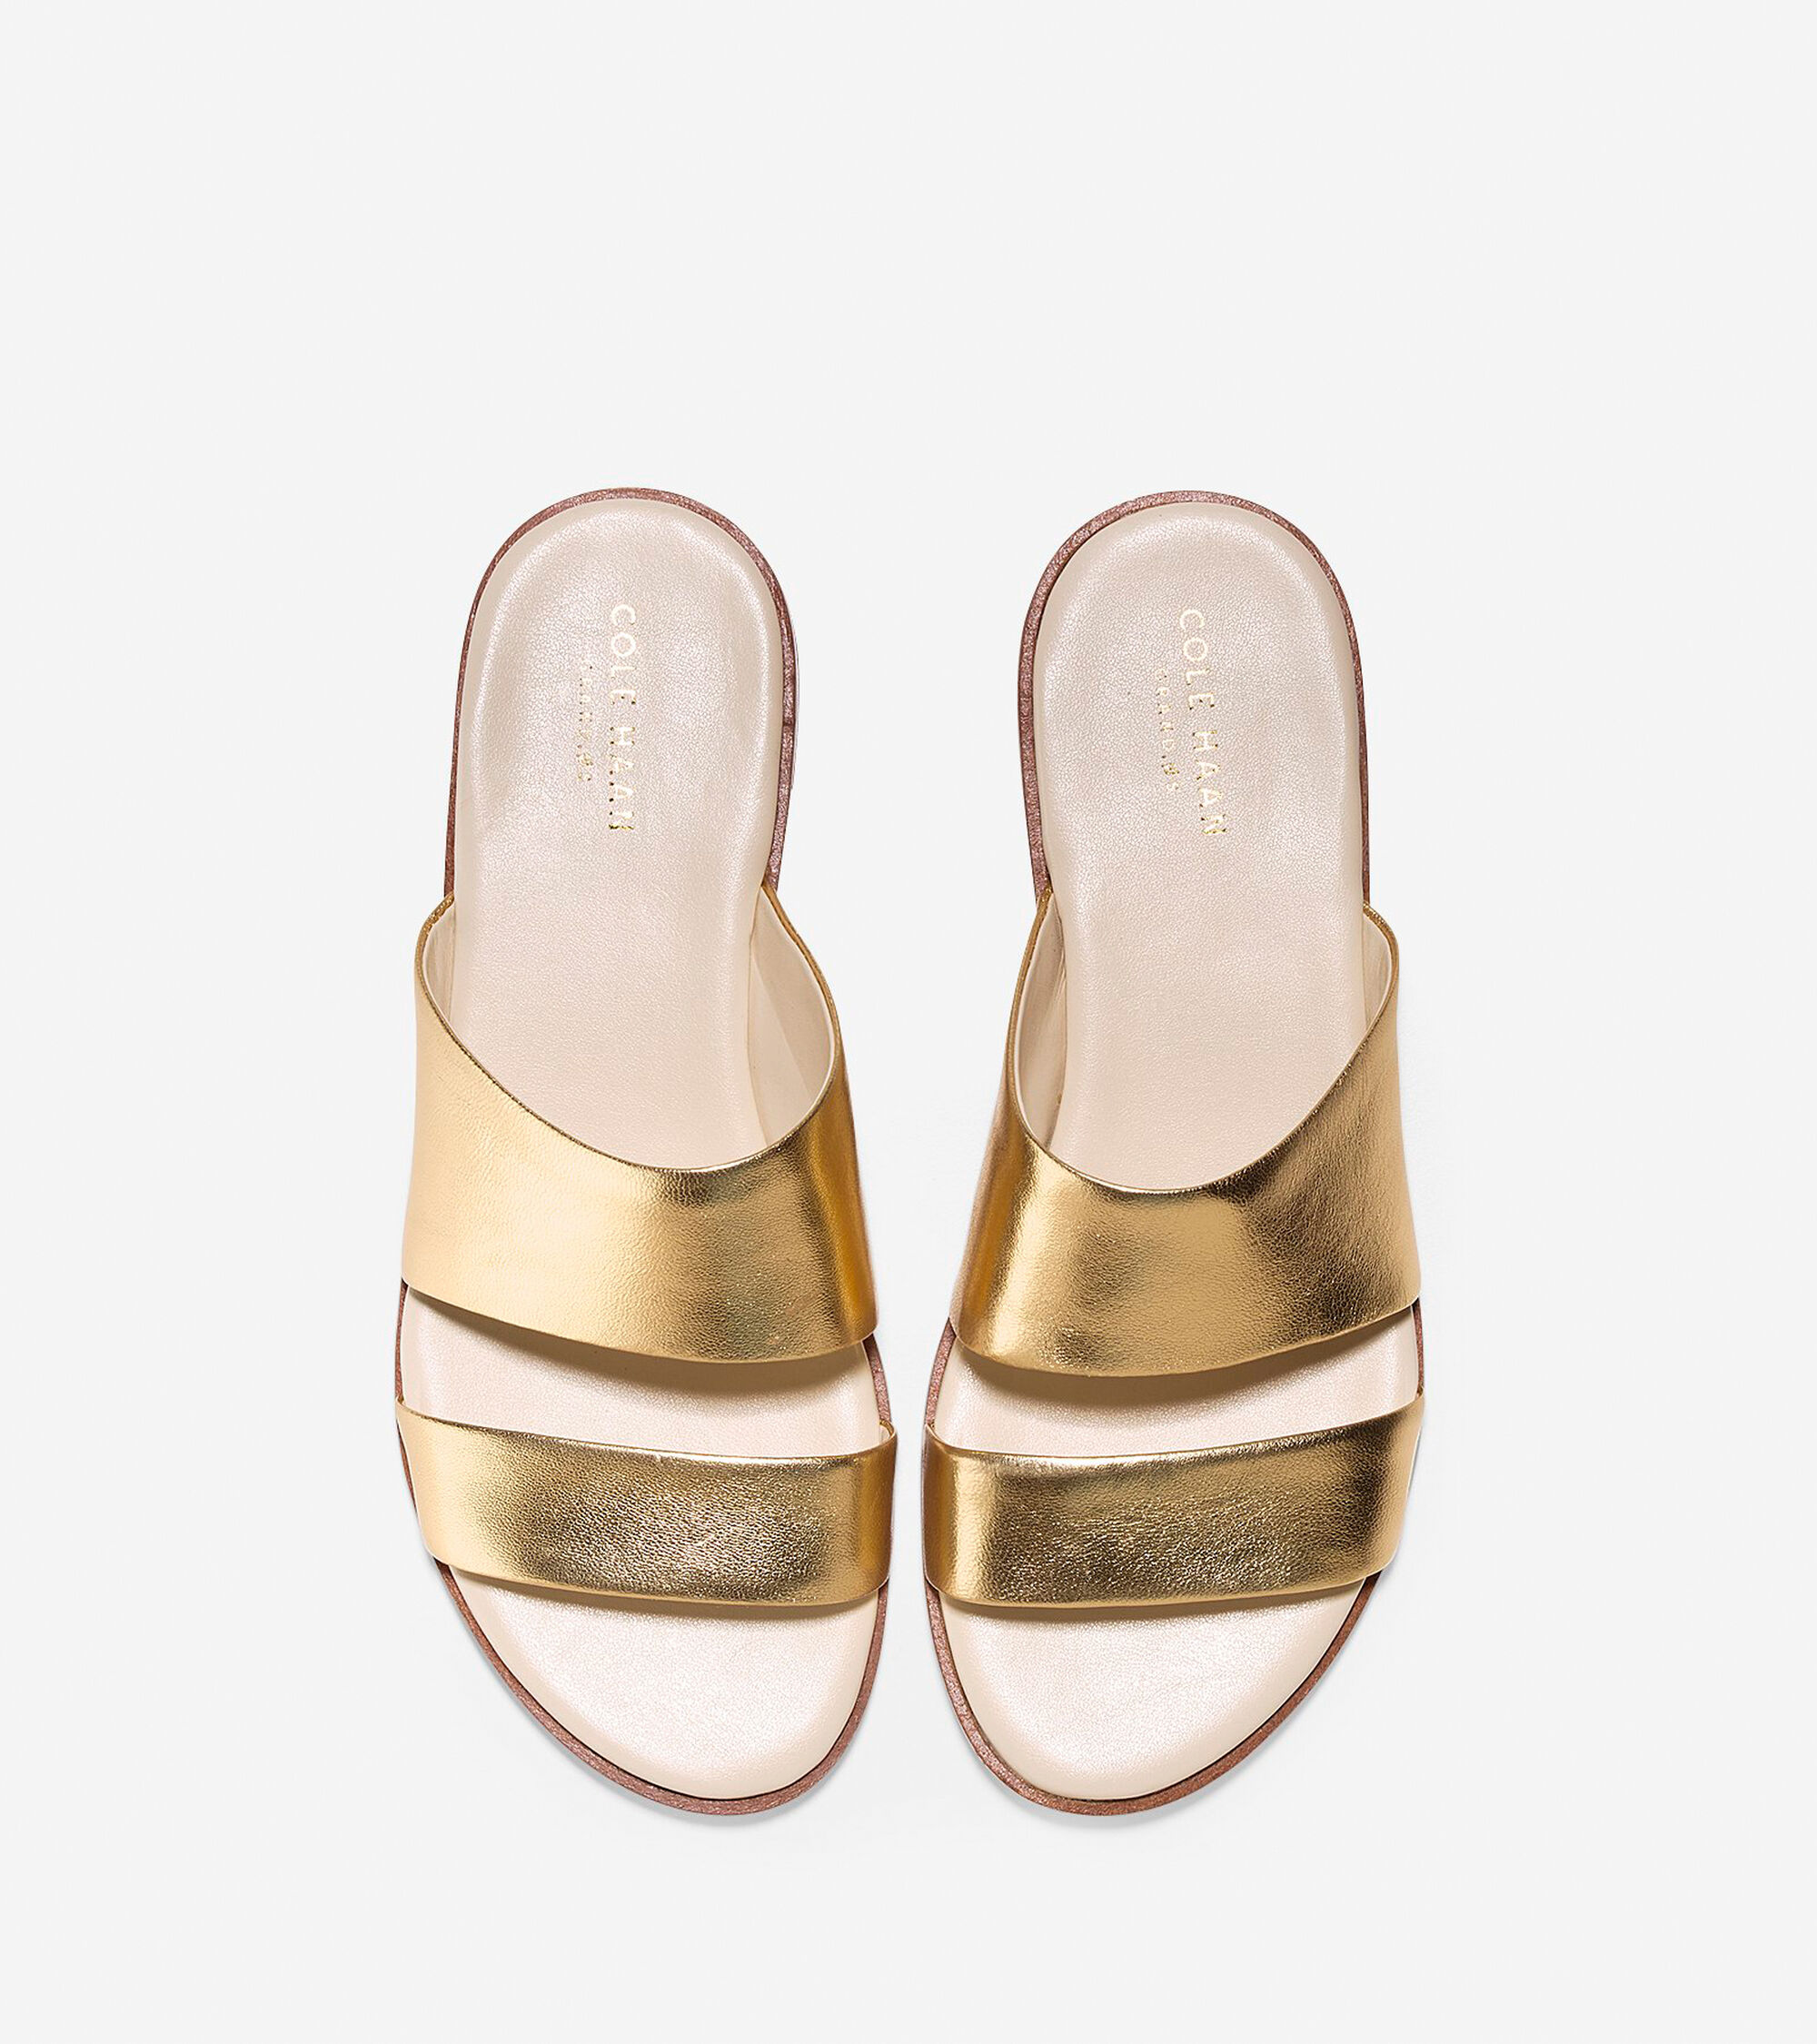 8495523156db Anica Slide Sandal · Anica Slide Sandal · Anica Slide Sandal · Anica Slide  Sandal.  COLEHAAN